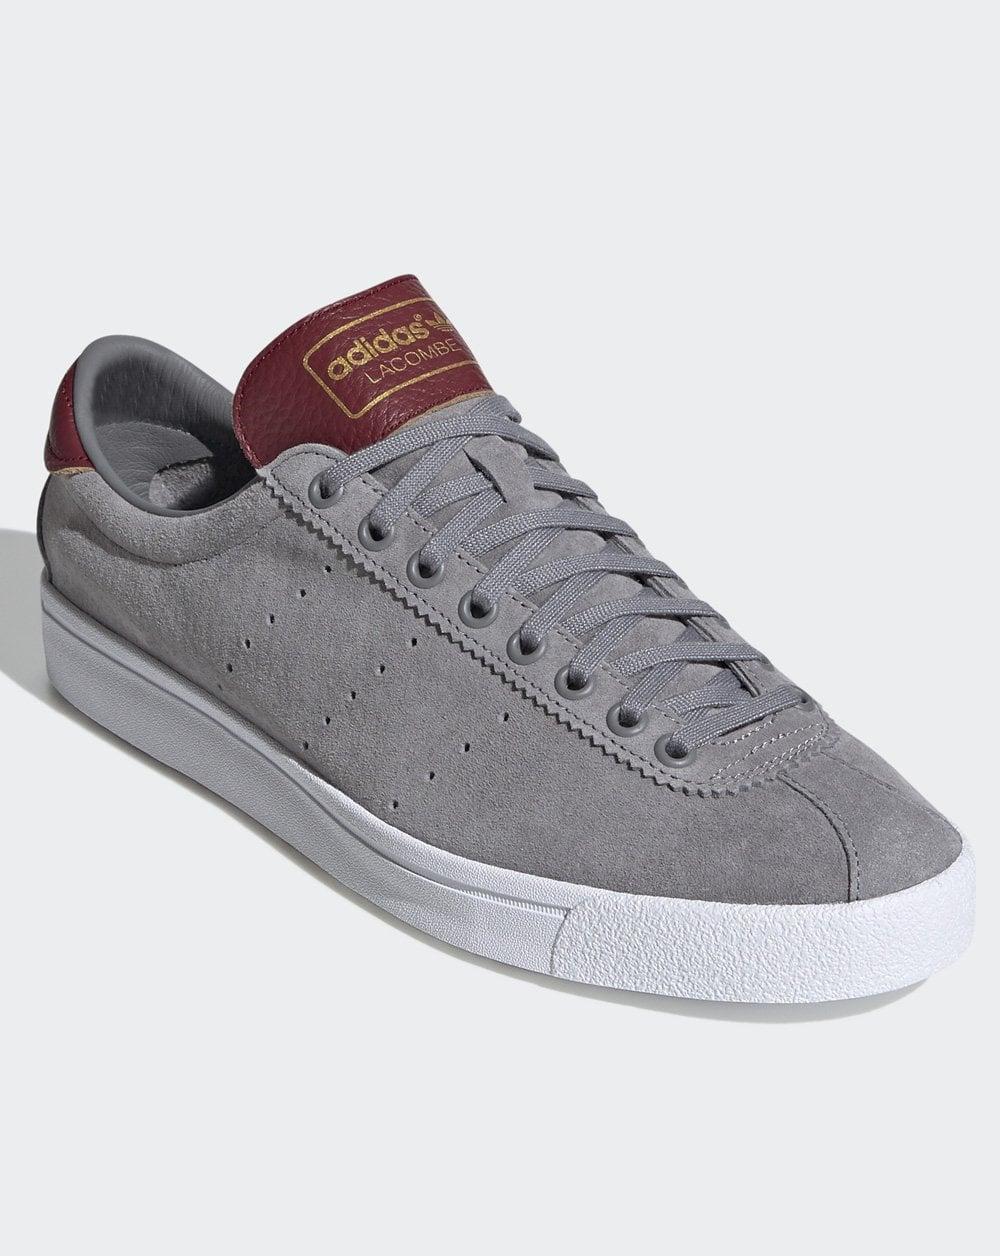 Adidas Lacombe Trainers Grey/Burgundy